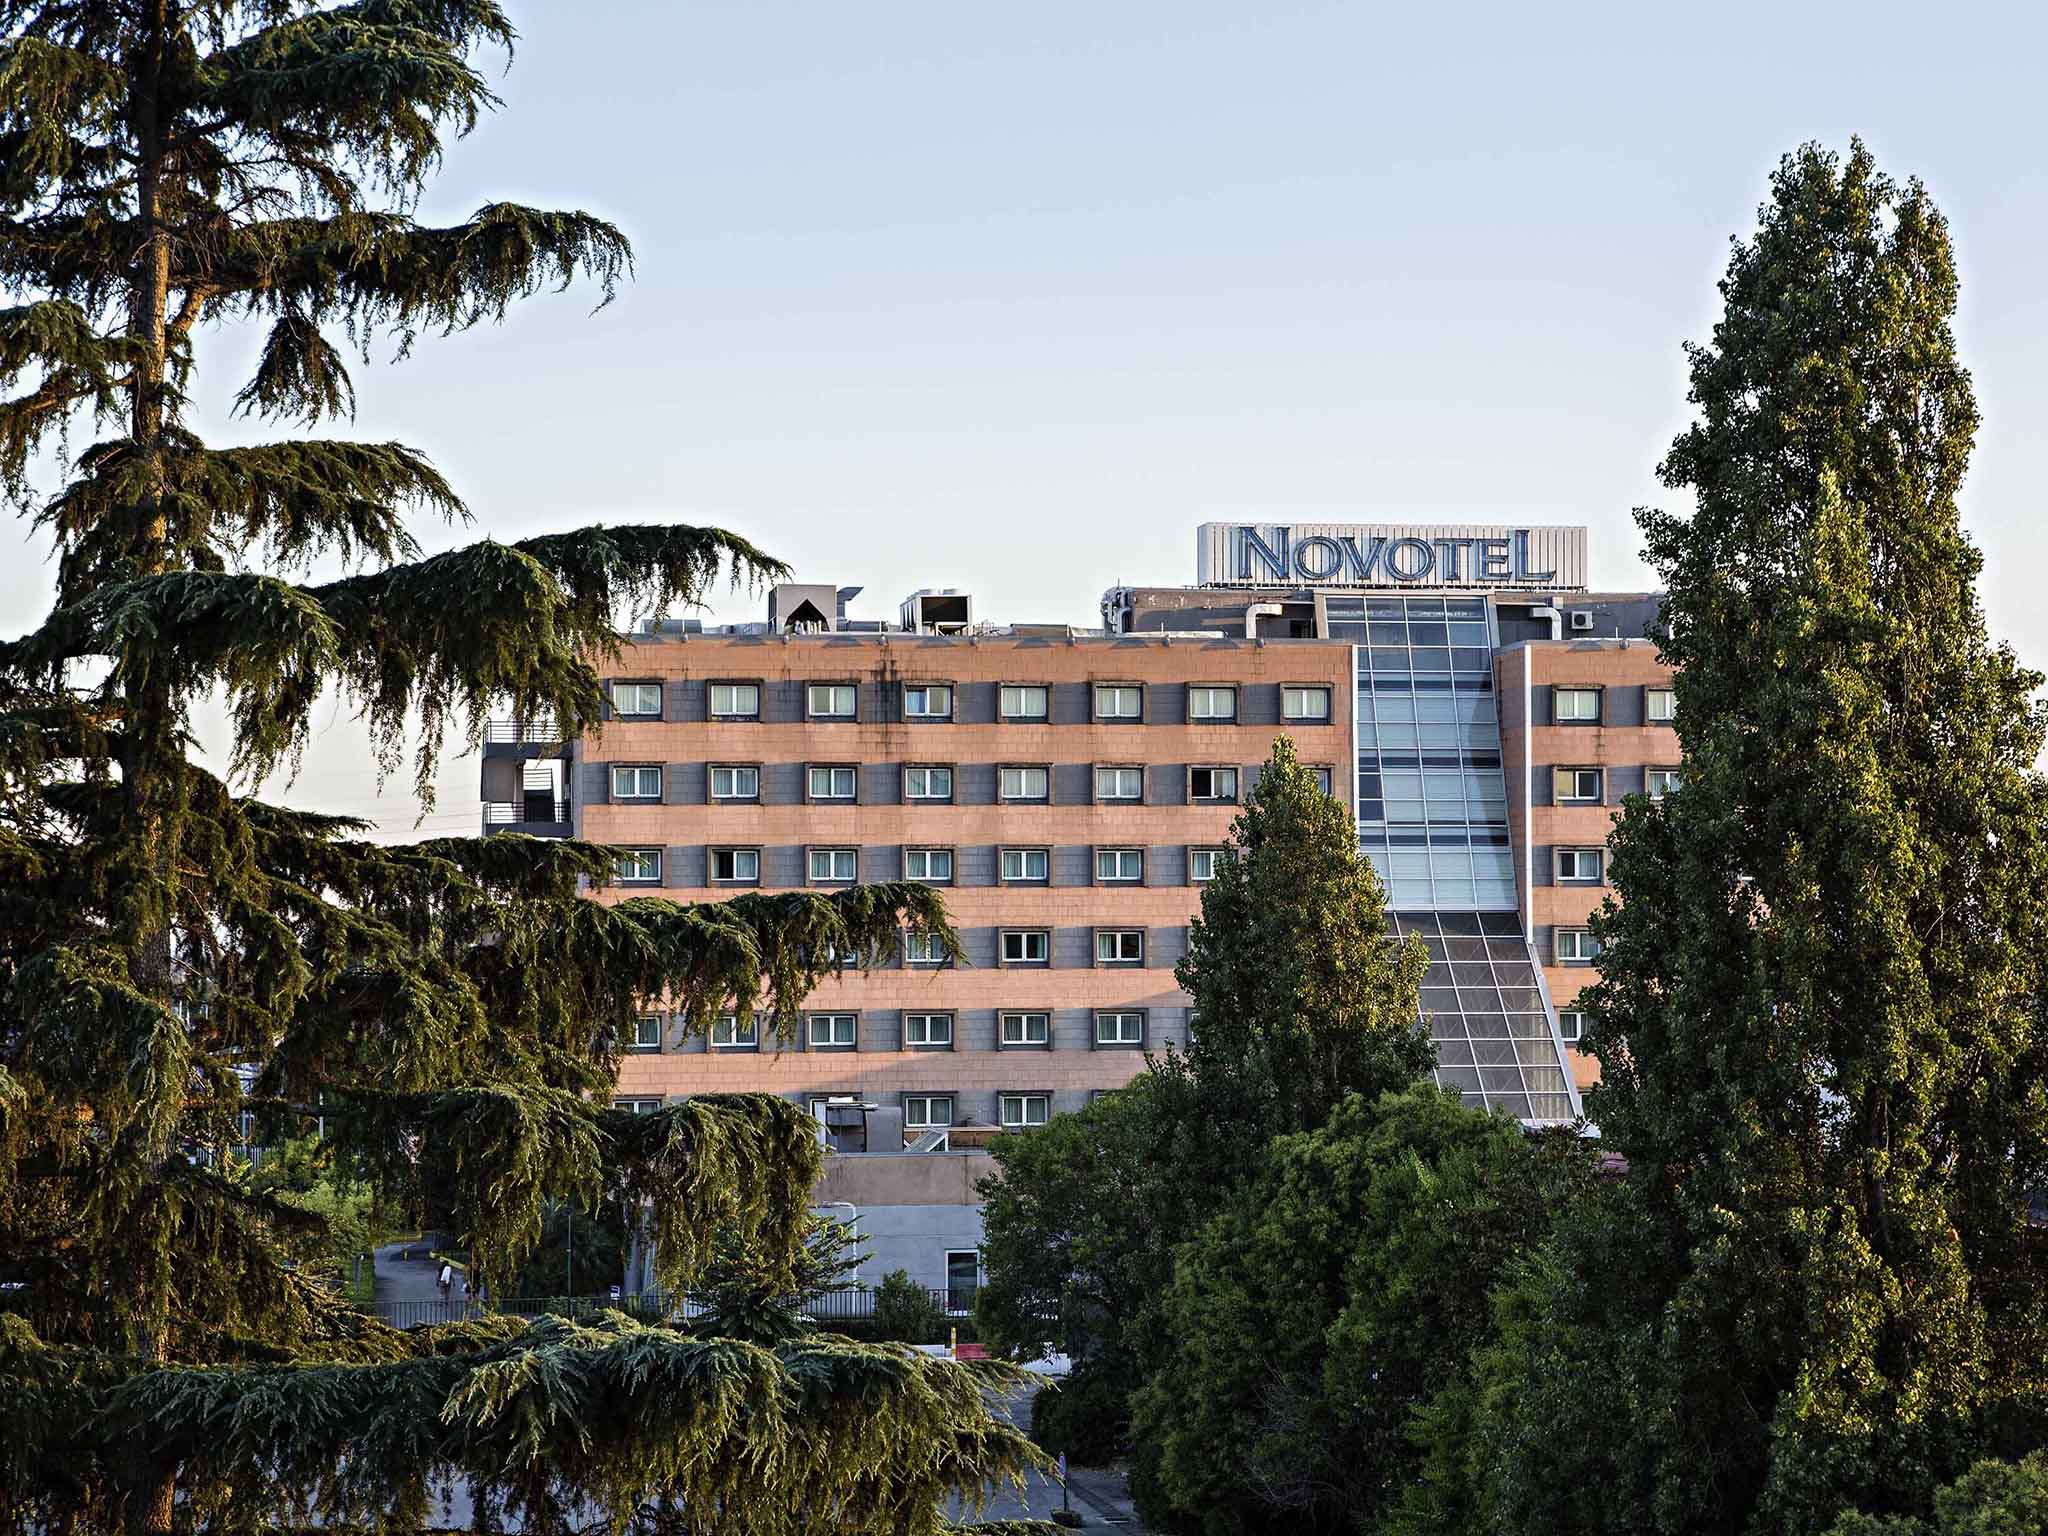 Hotell – Novotel Caserta Sud